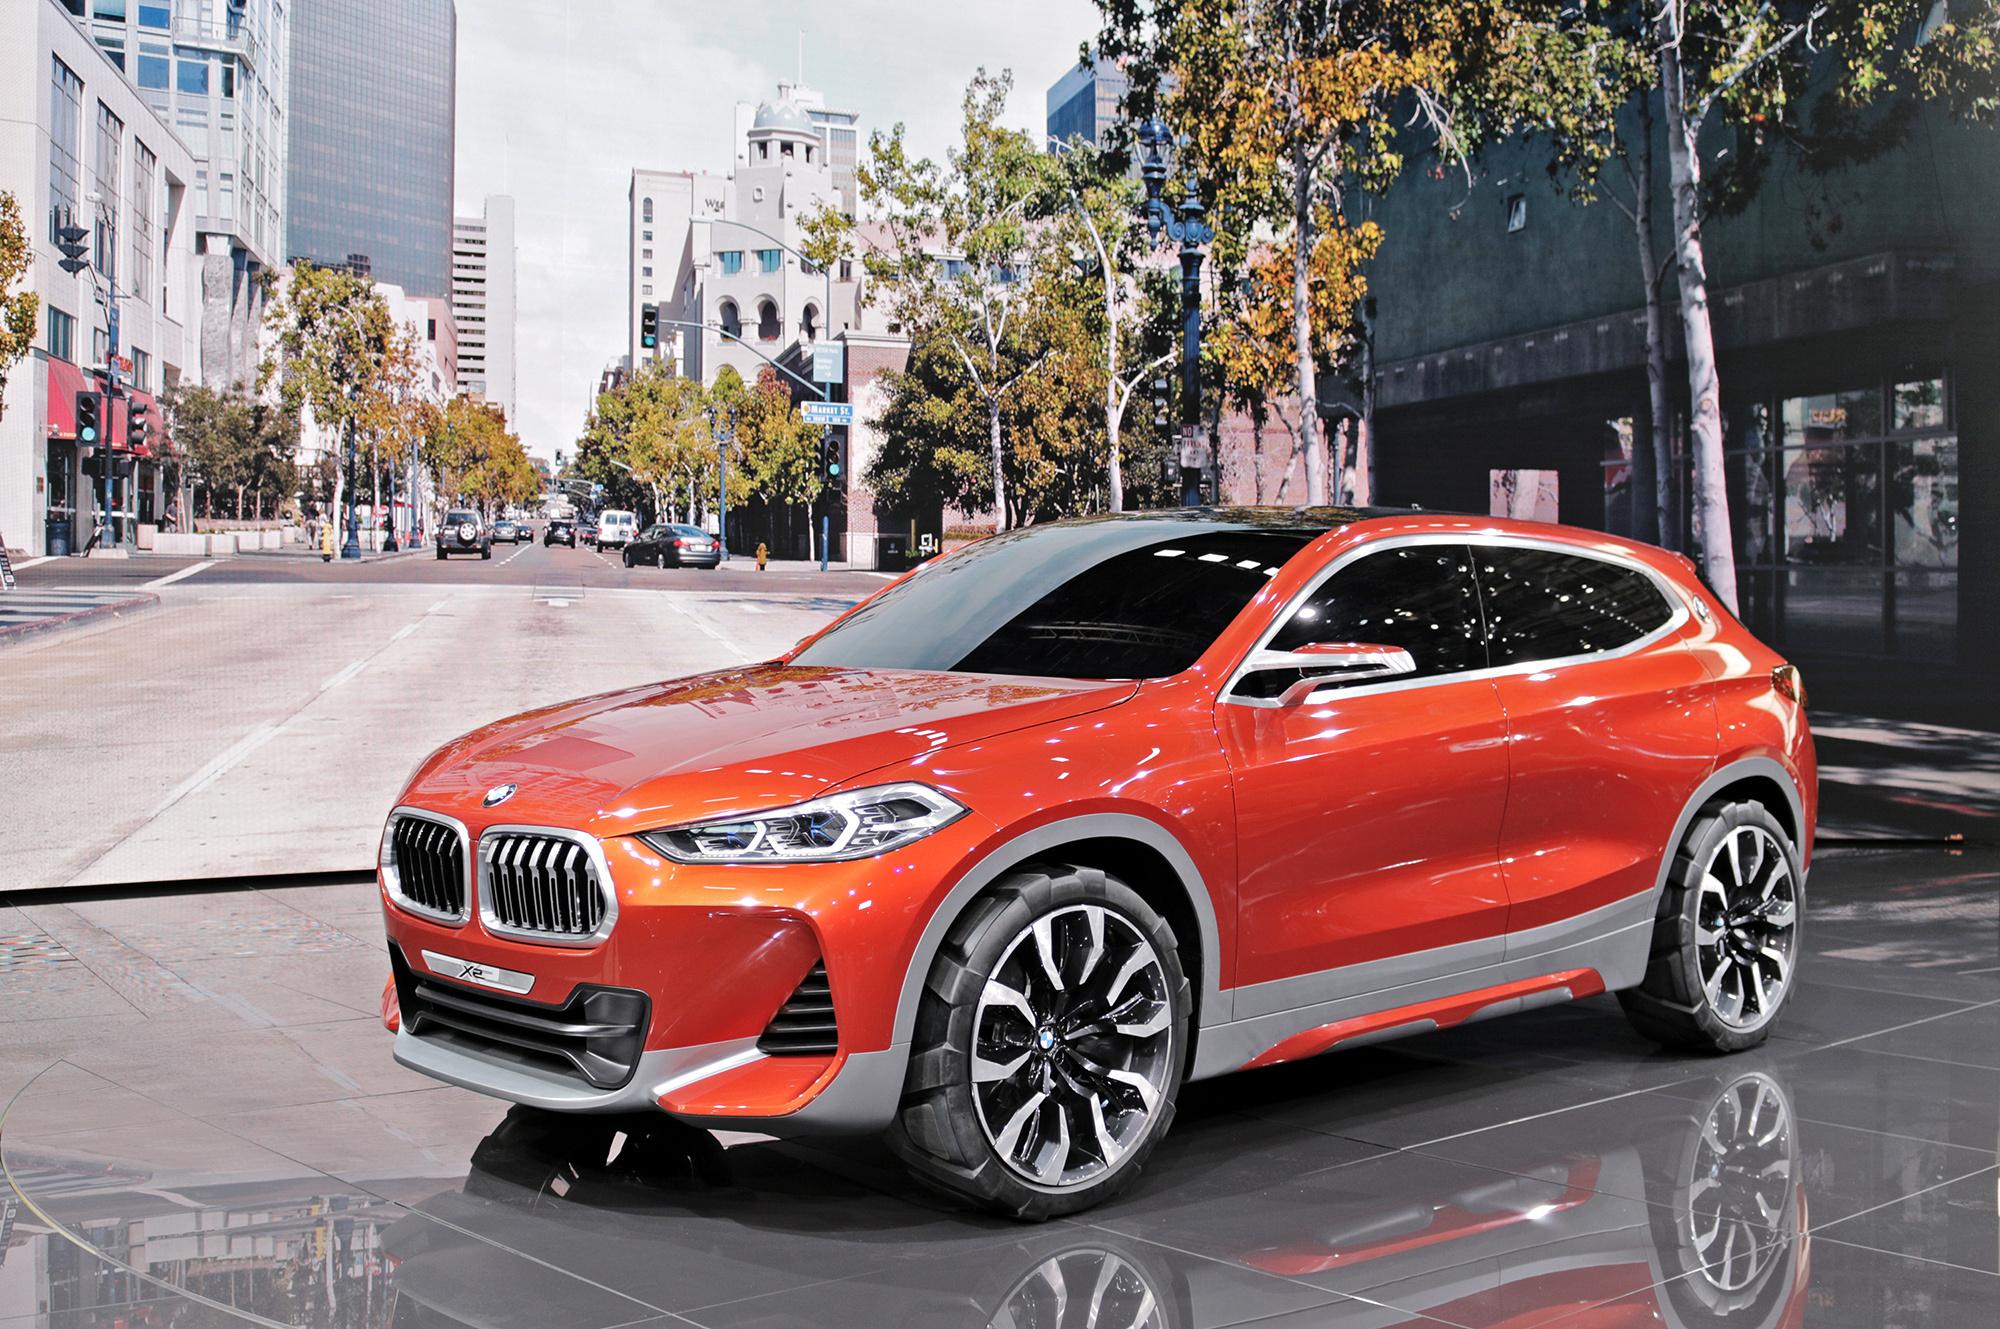 BMW X2 Deskto